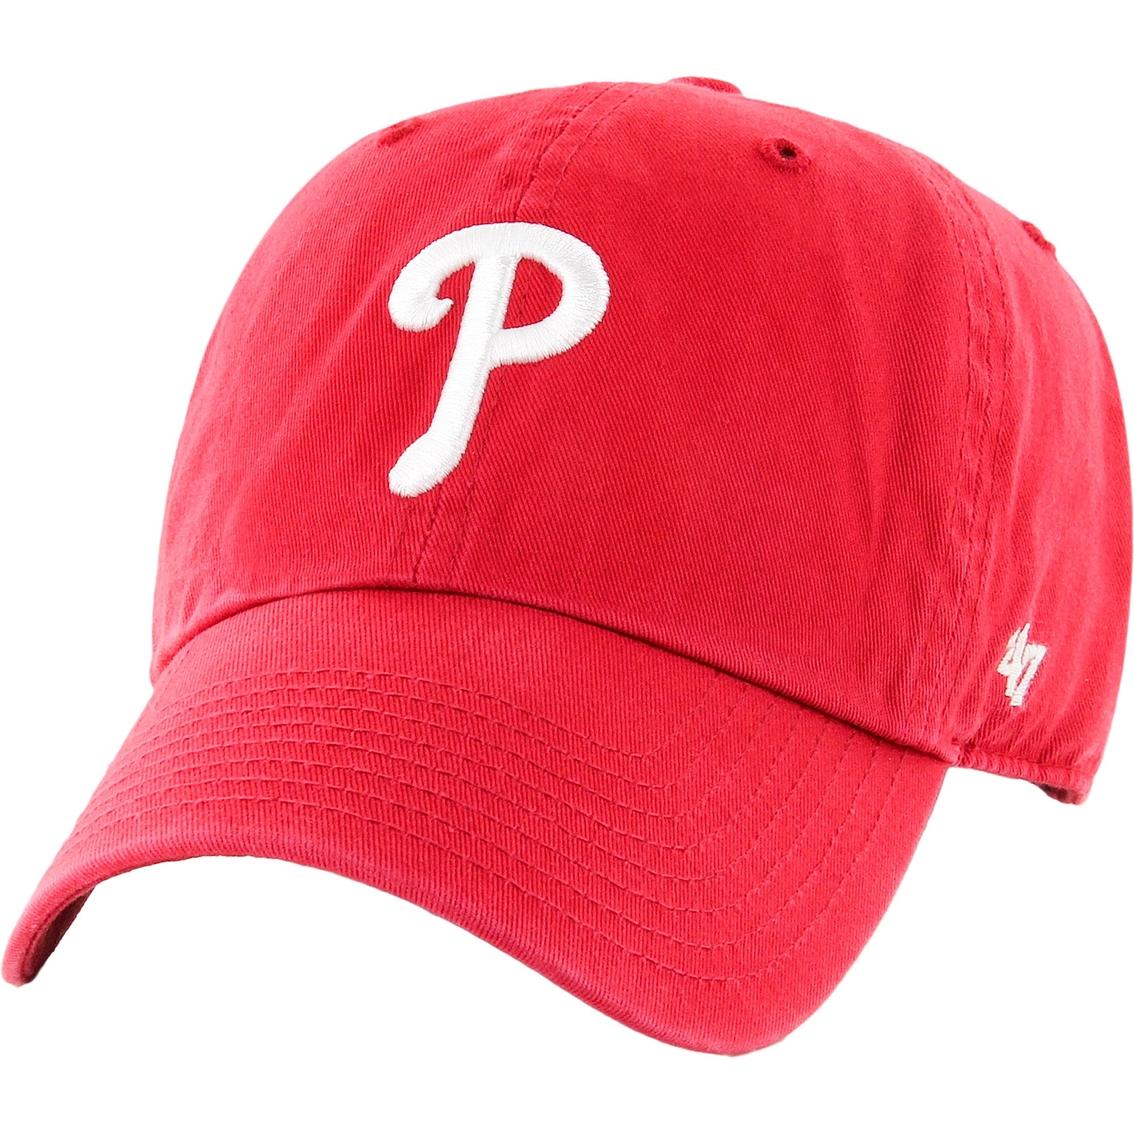 a8e732ad9ed 47 Brand Mlb Philadelphia Phillies Men s Clean Up Baseball Cap ...